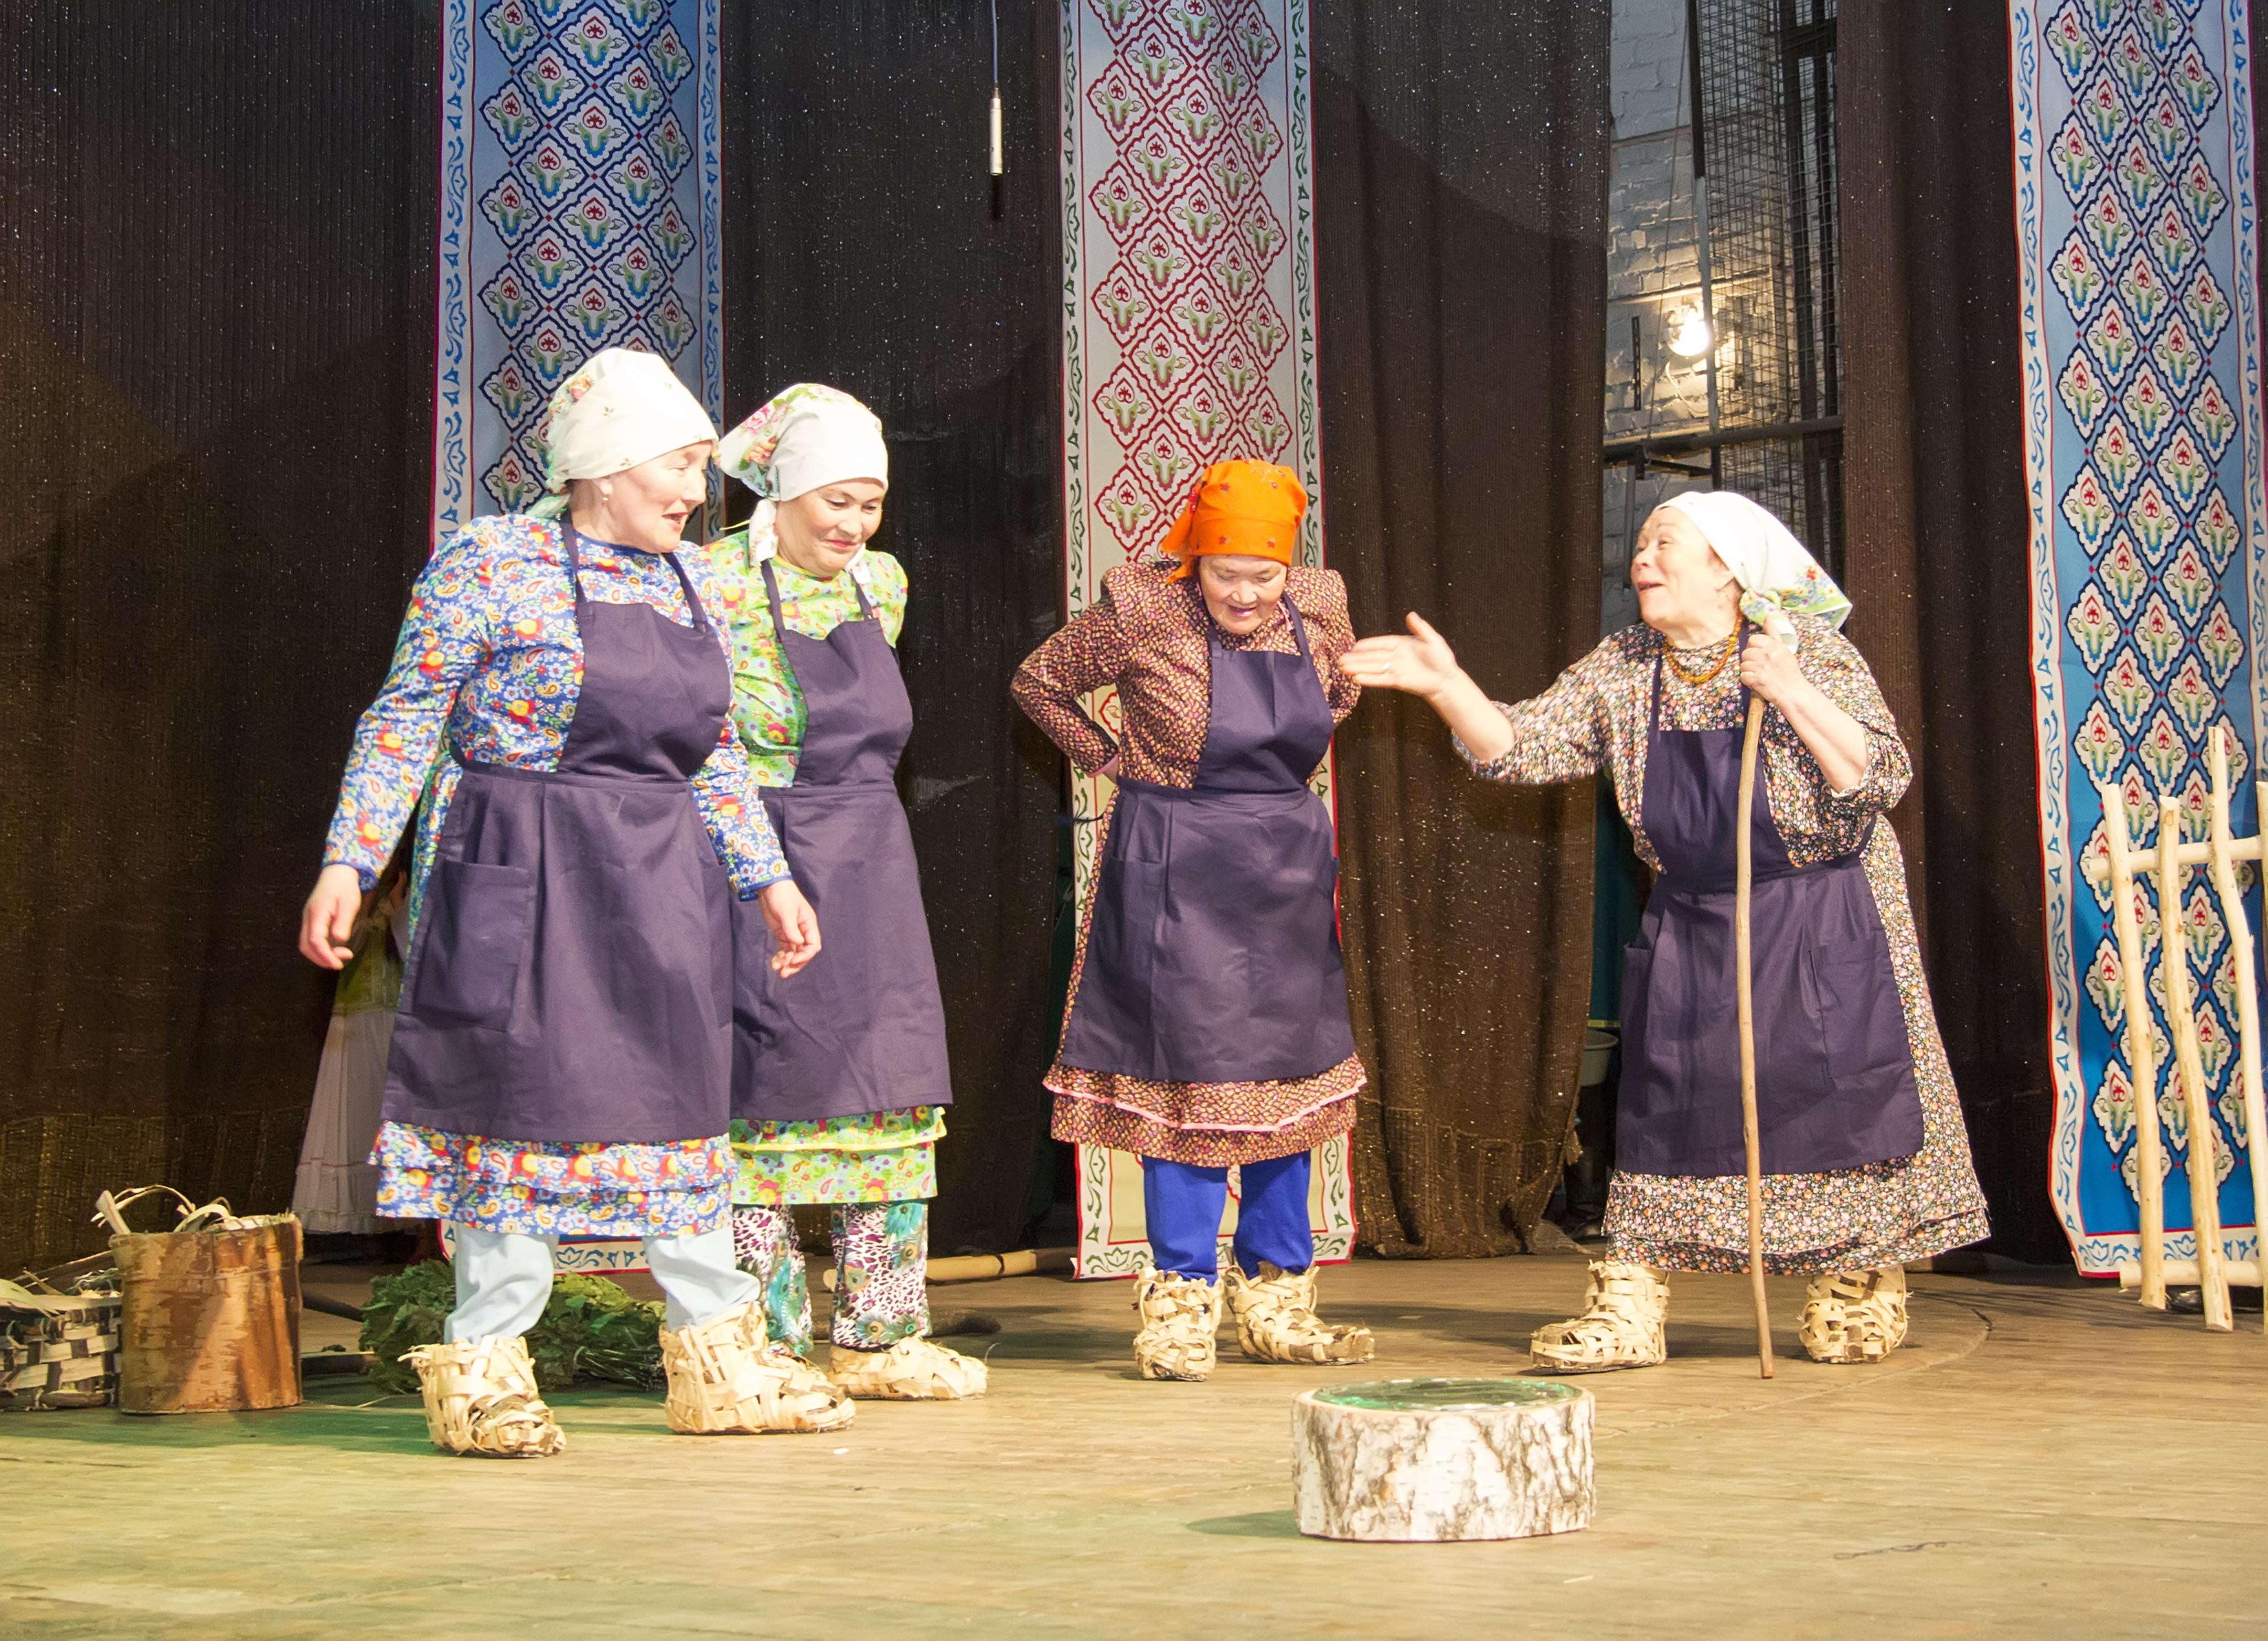 У сибирских татар скуднеет жанр баитов и мунаджатов